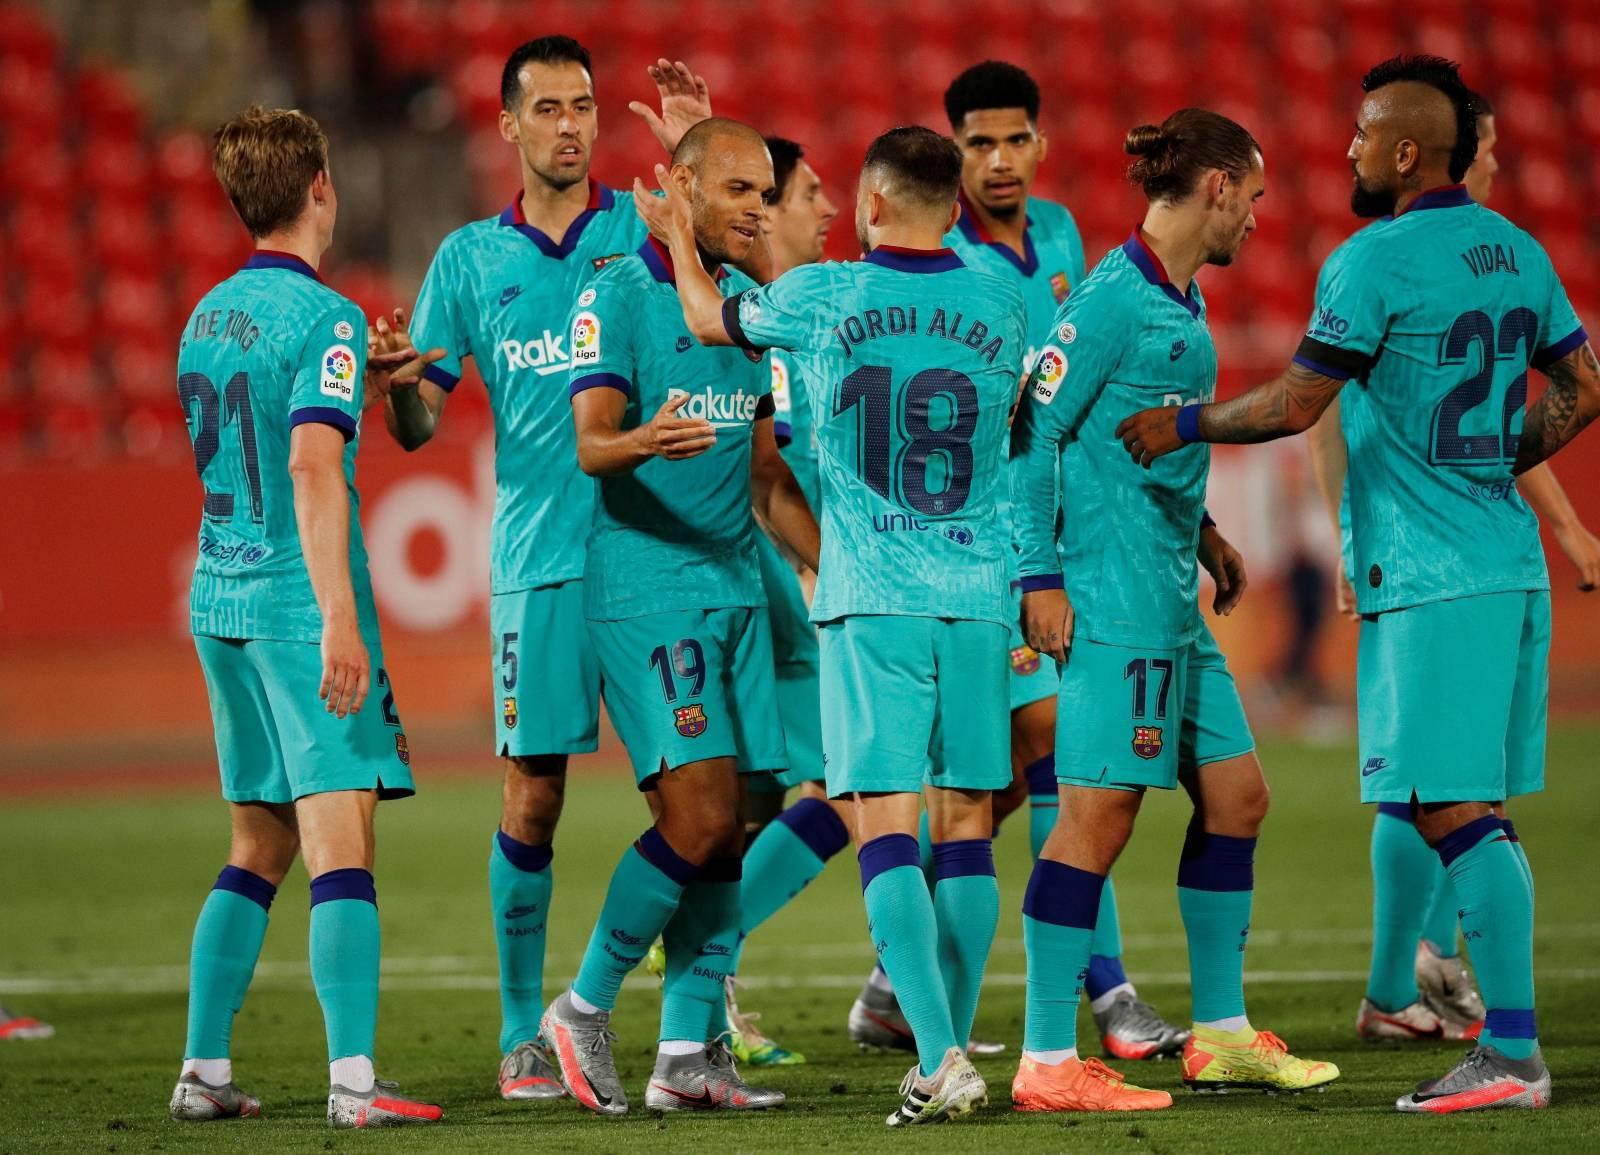 La Liga Santander - RCD Mallorca v FC Barcelona